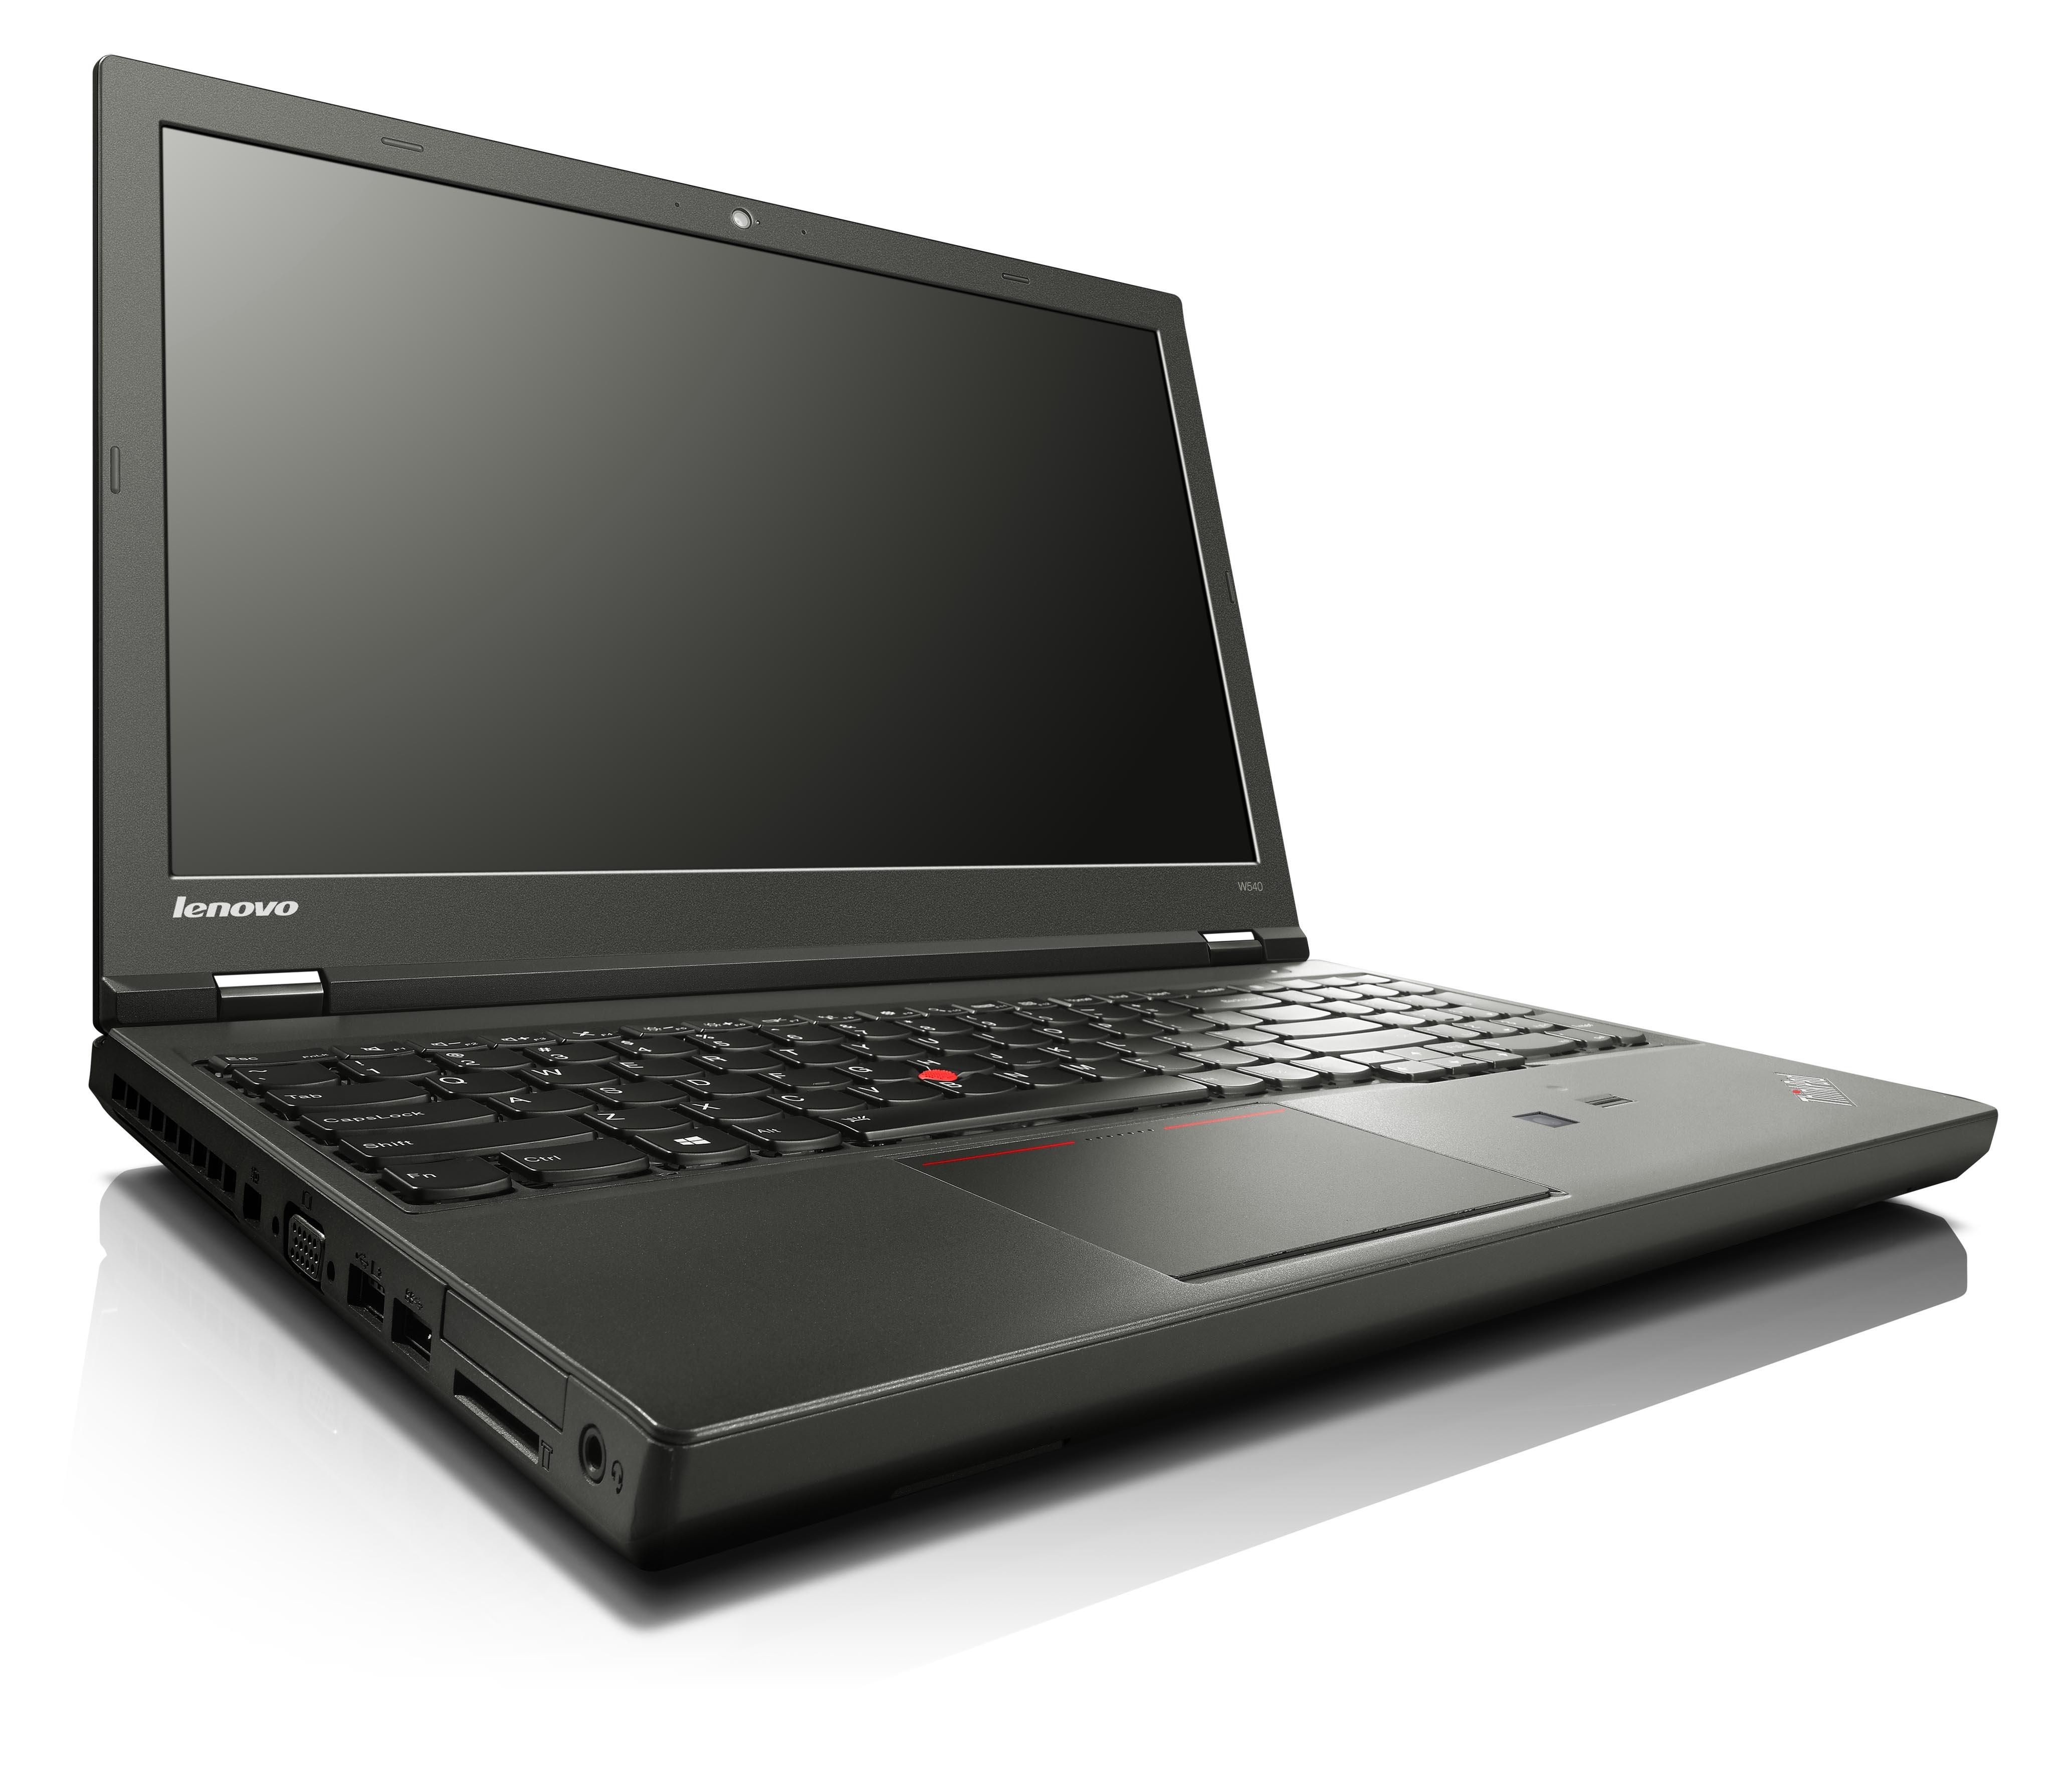 Lenovo Thinkpad W540 SSD